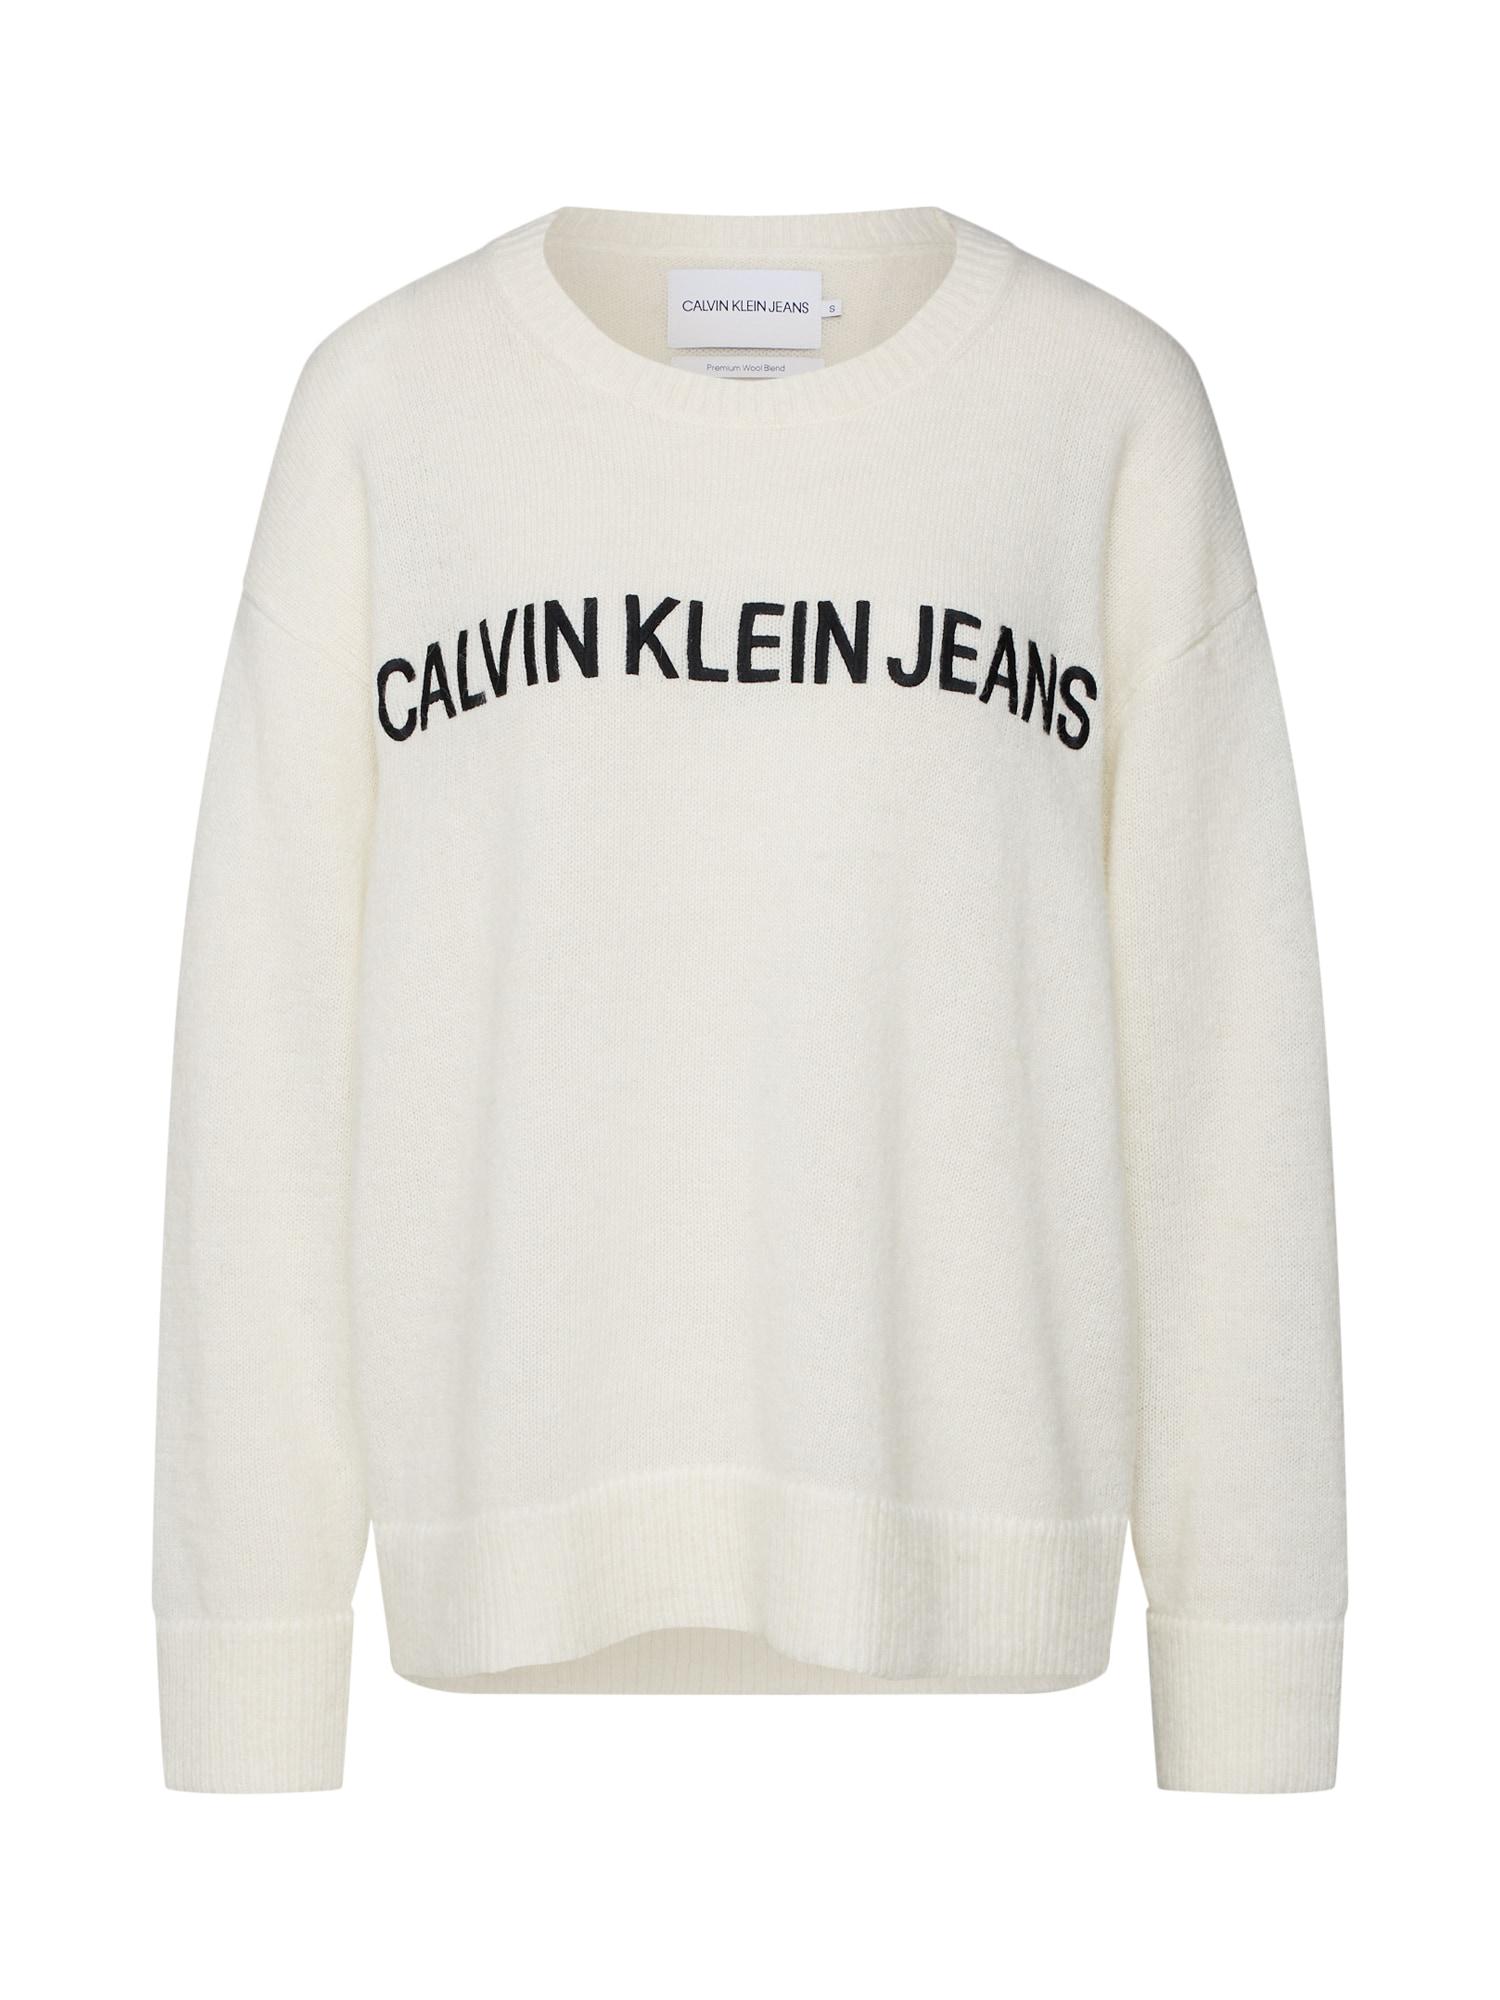 Zwart Wit Trui Dames.Aanbieding Calvin Klein Jeans Dames Trui Zwart Wit Calvin Klein